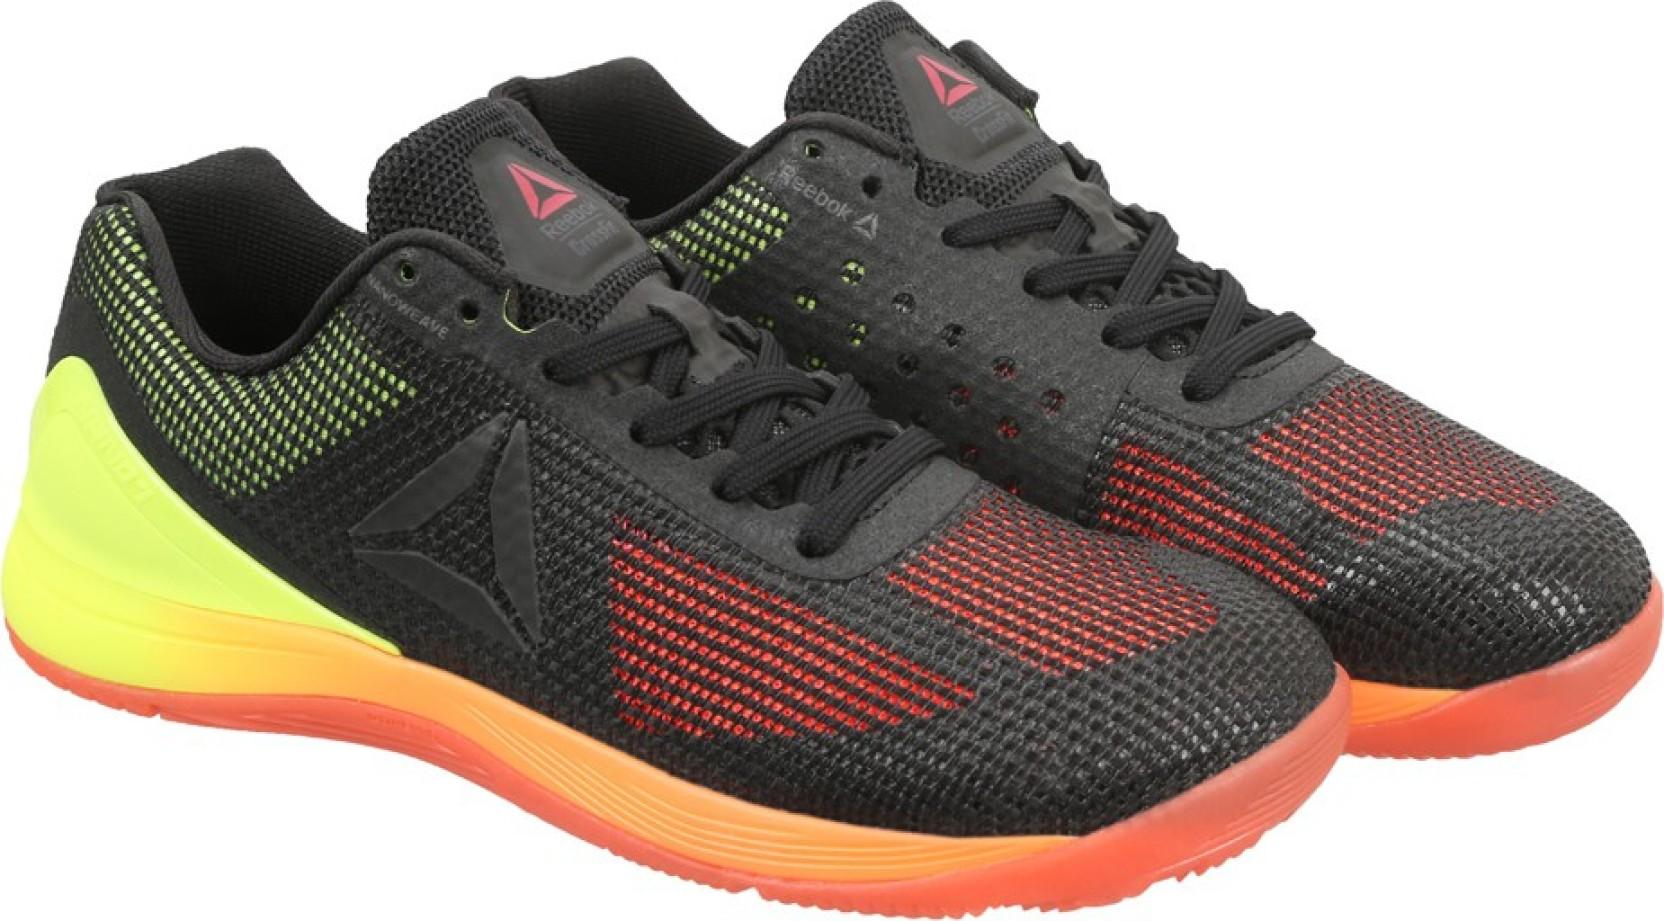 80ff8f7fc REEBOK R CROSSFIT NANO 7.0 Training   Gym Shoes For Men (Multicolor)